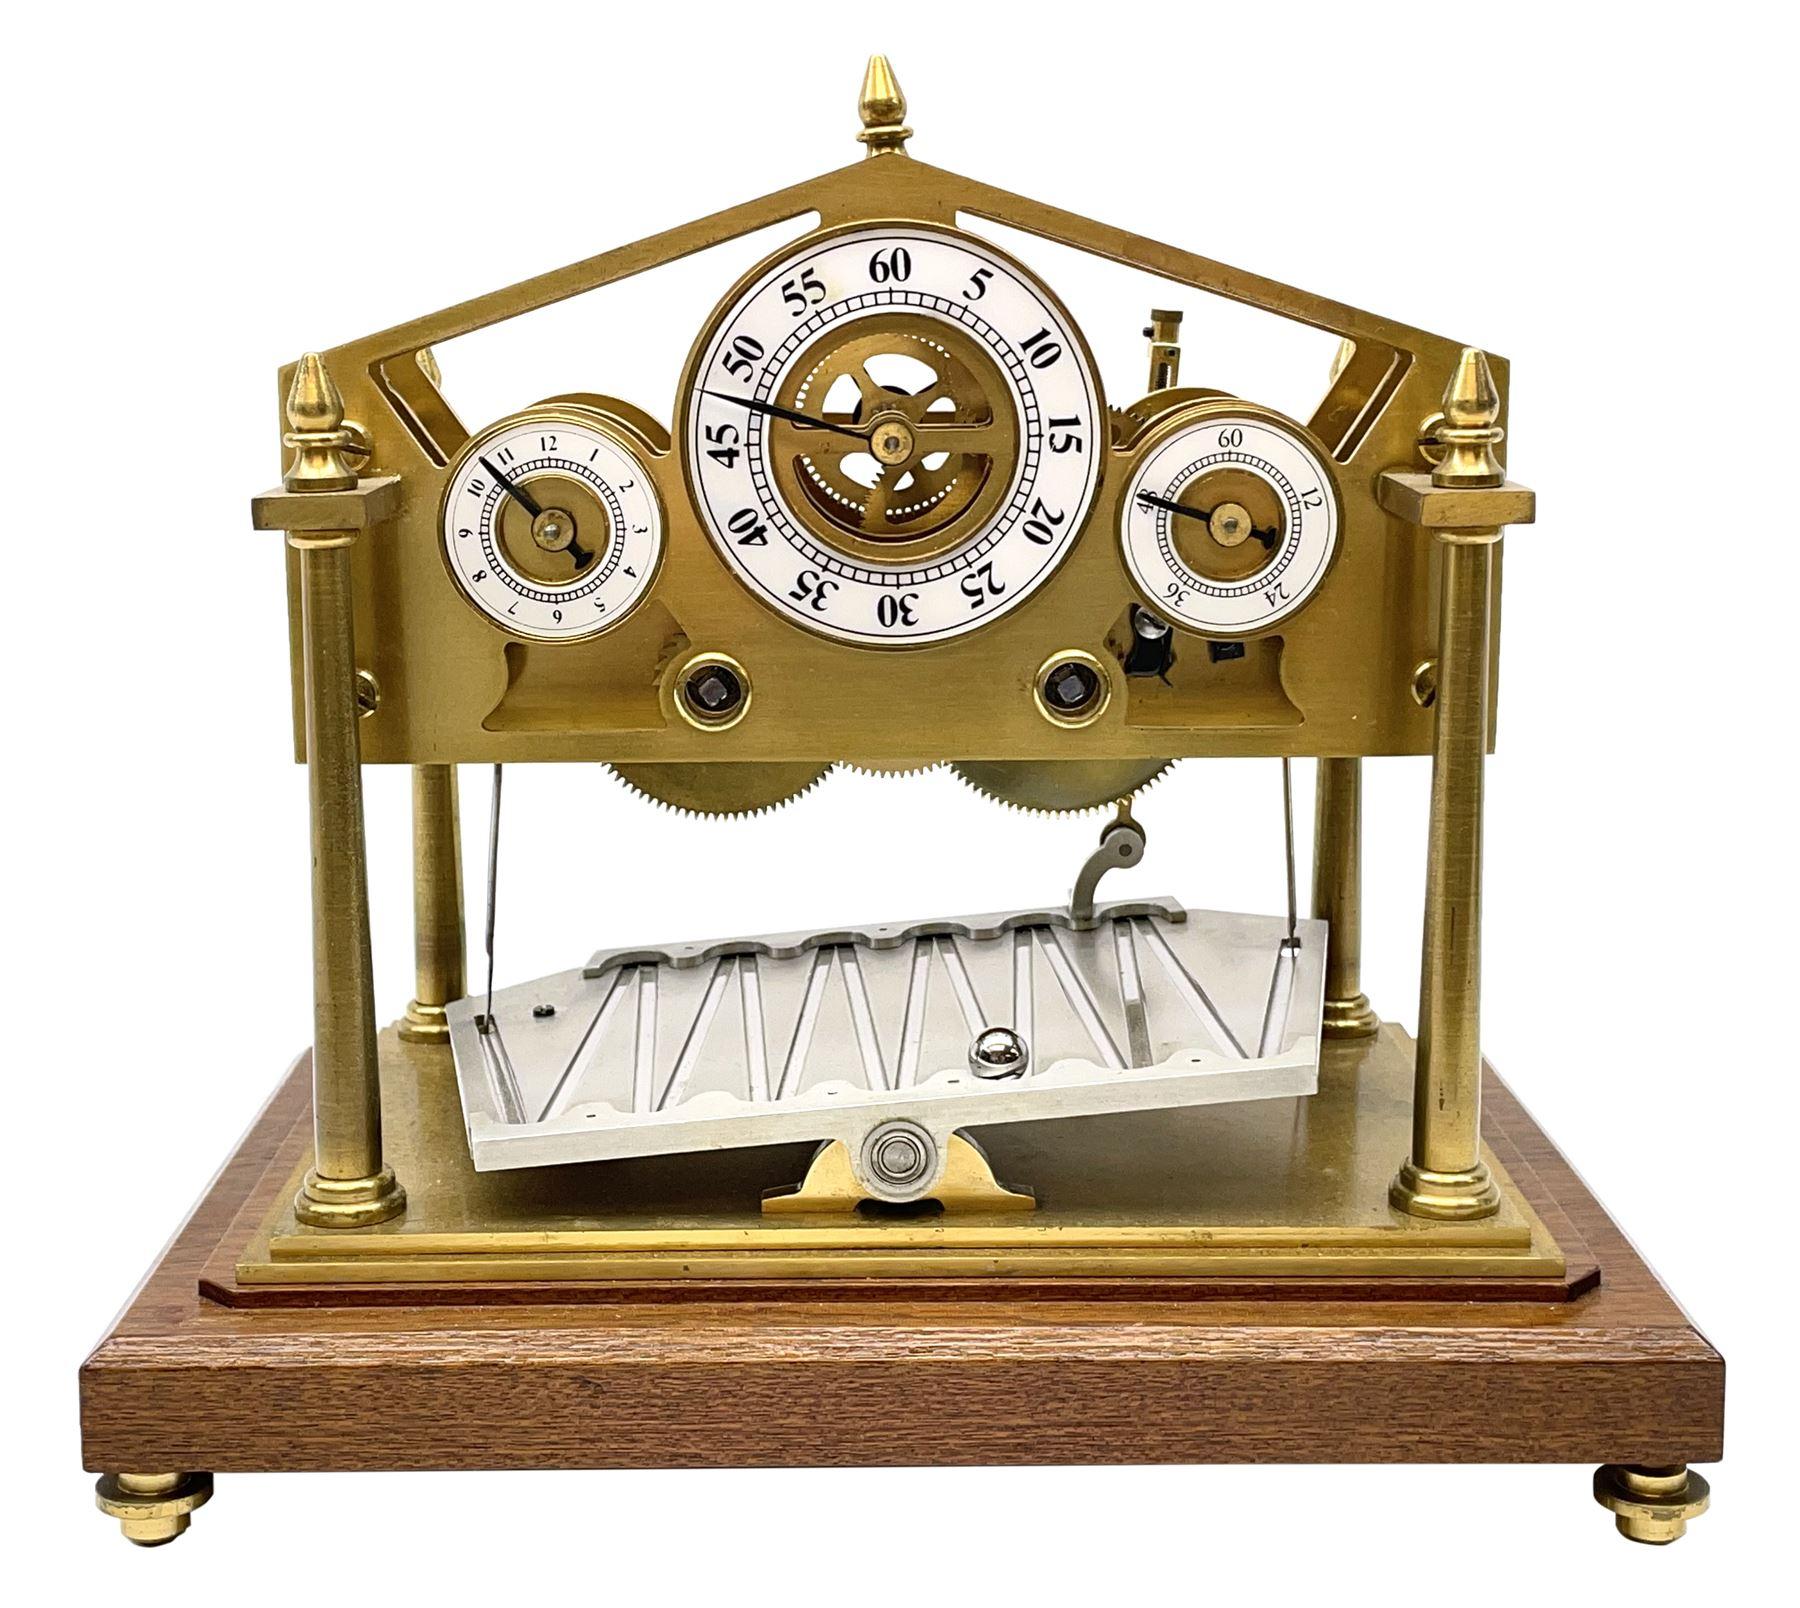 Mid 20th century 'Congreve' rolling ball clock